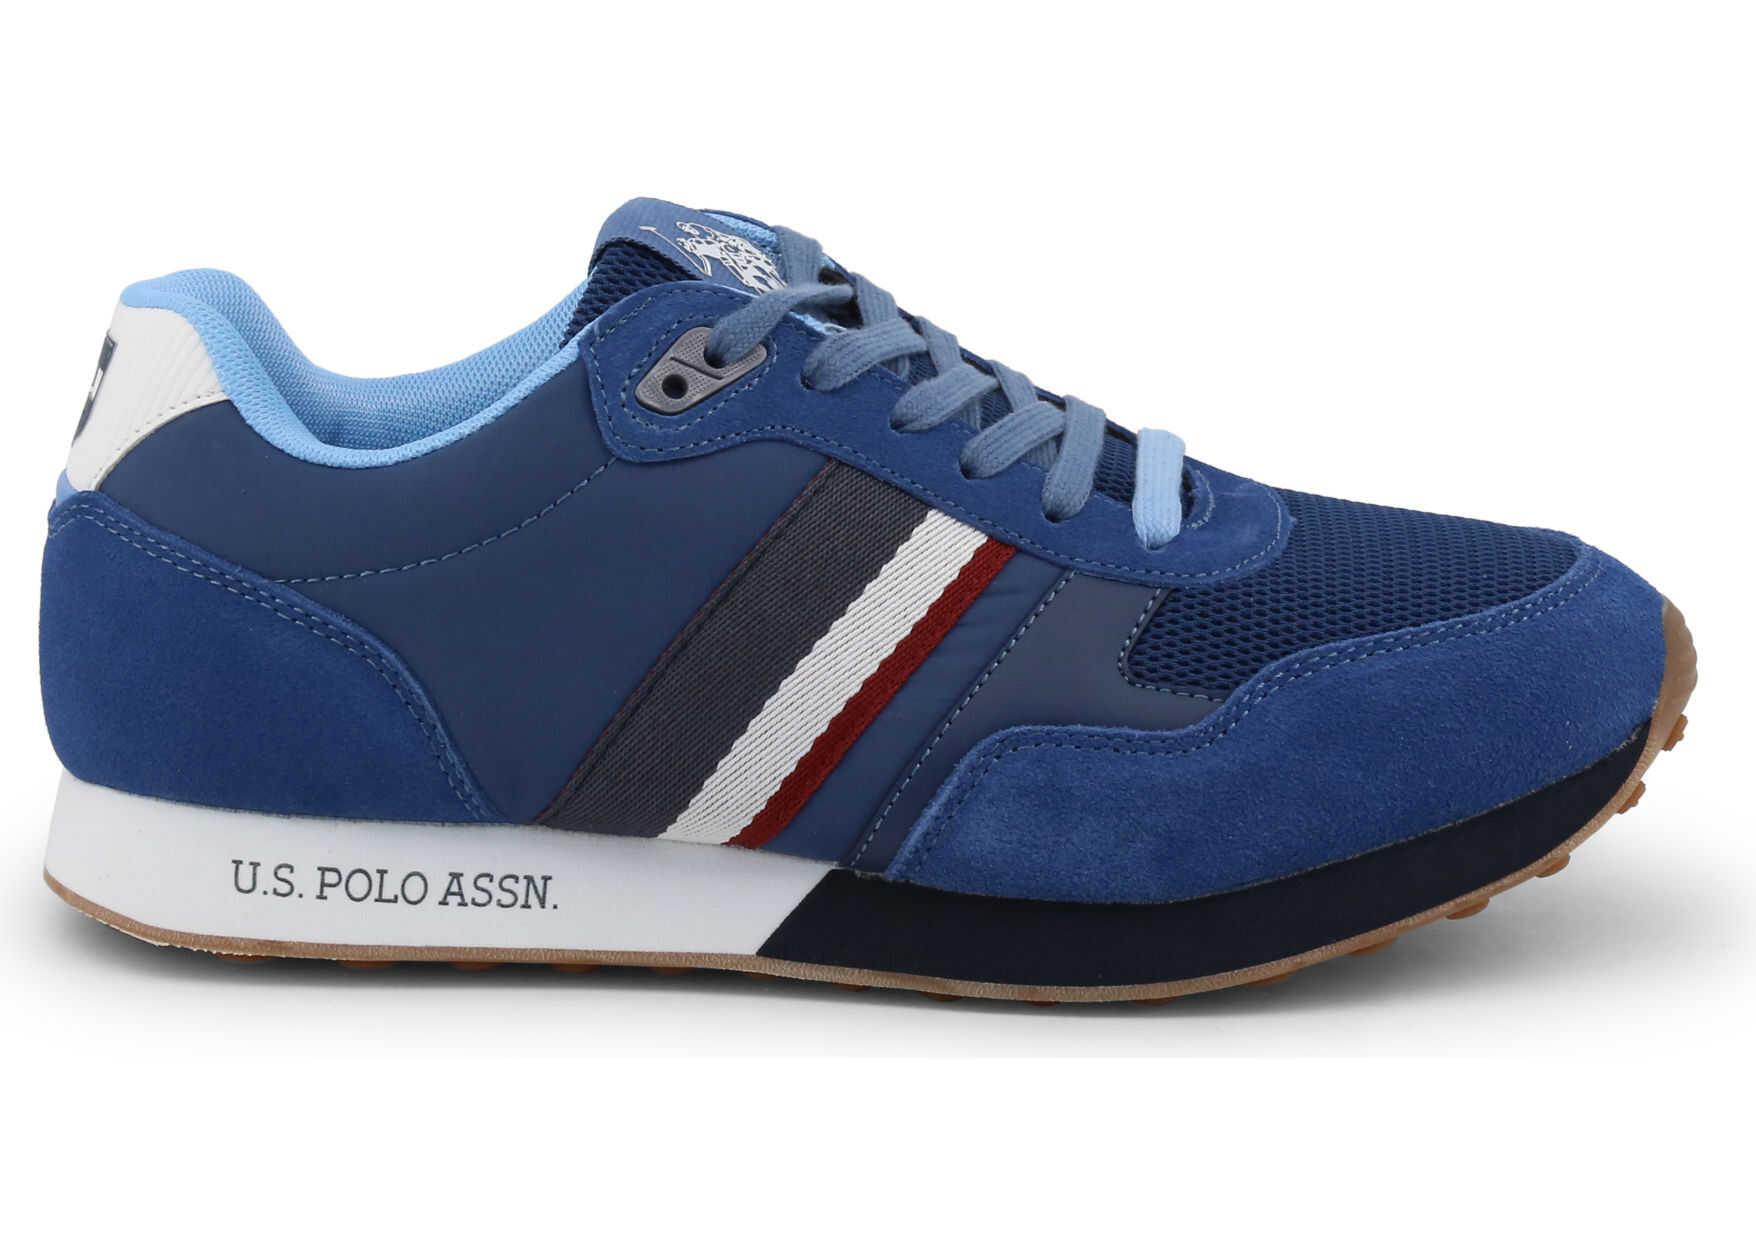 U.S. POLO ASSN. Flash4088S9_Sn1 Blue